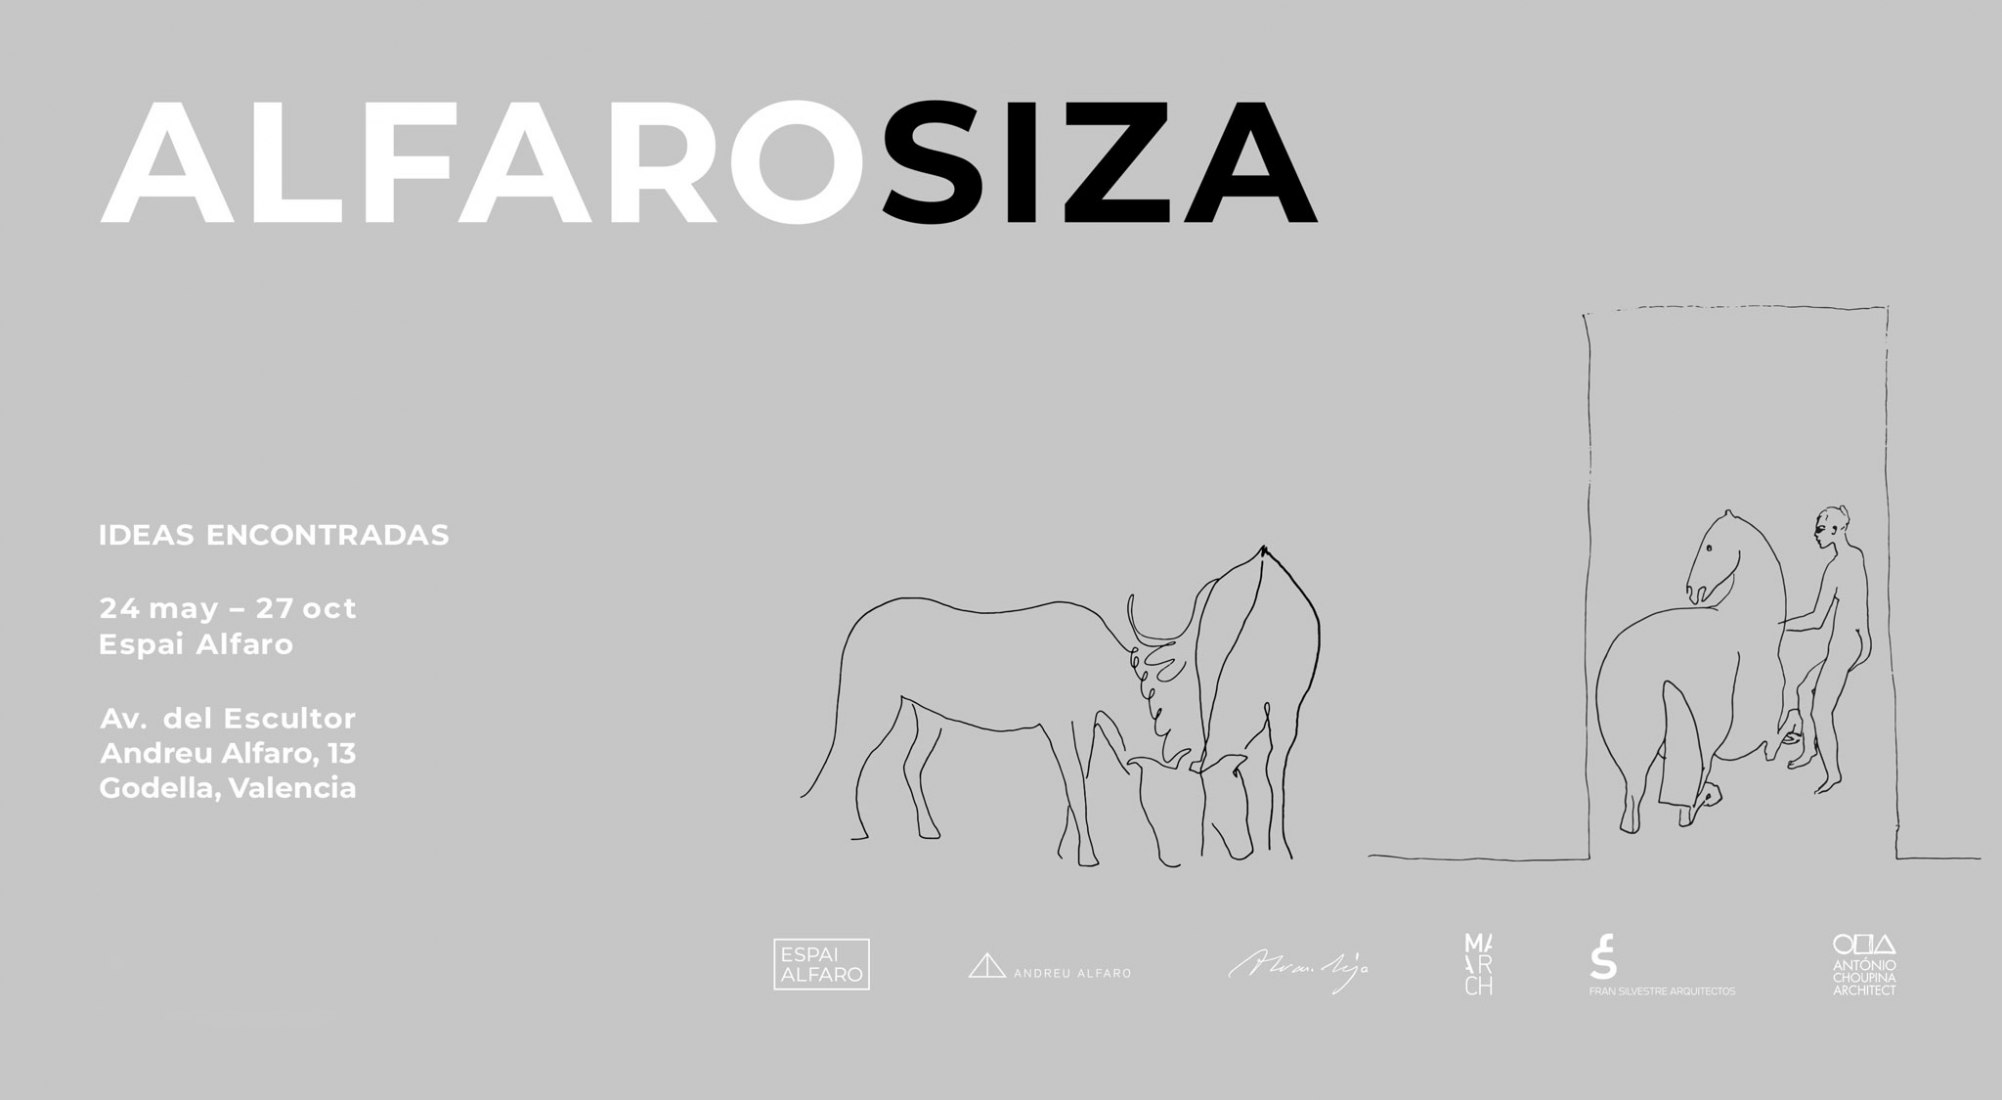 Poster. ALFAROSIZA. Ideas encontradas